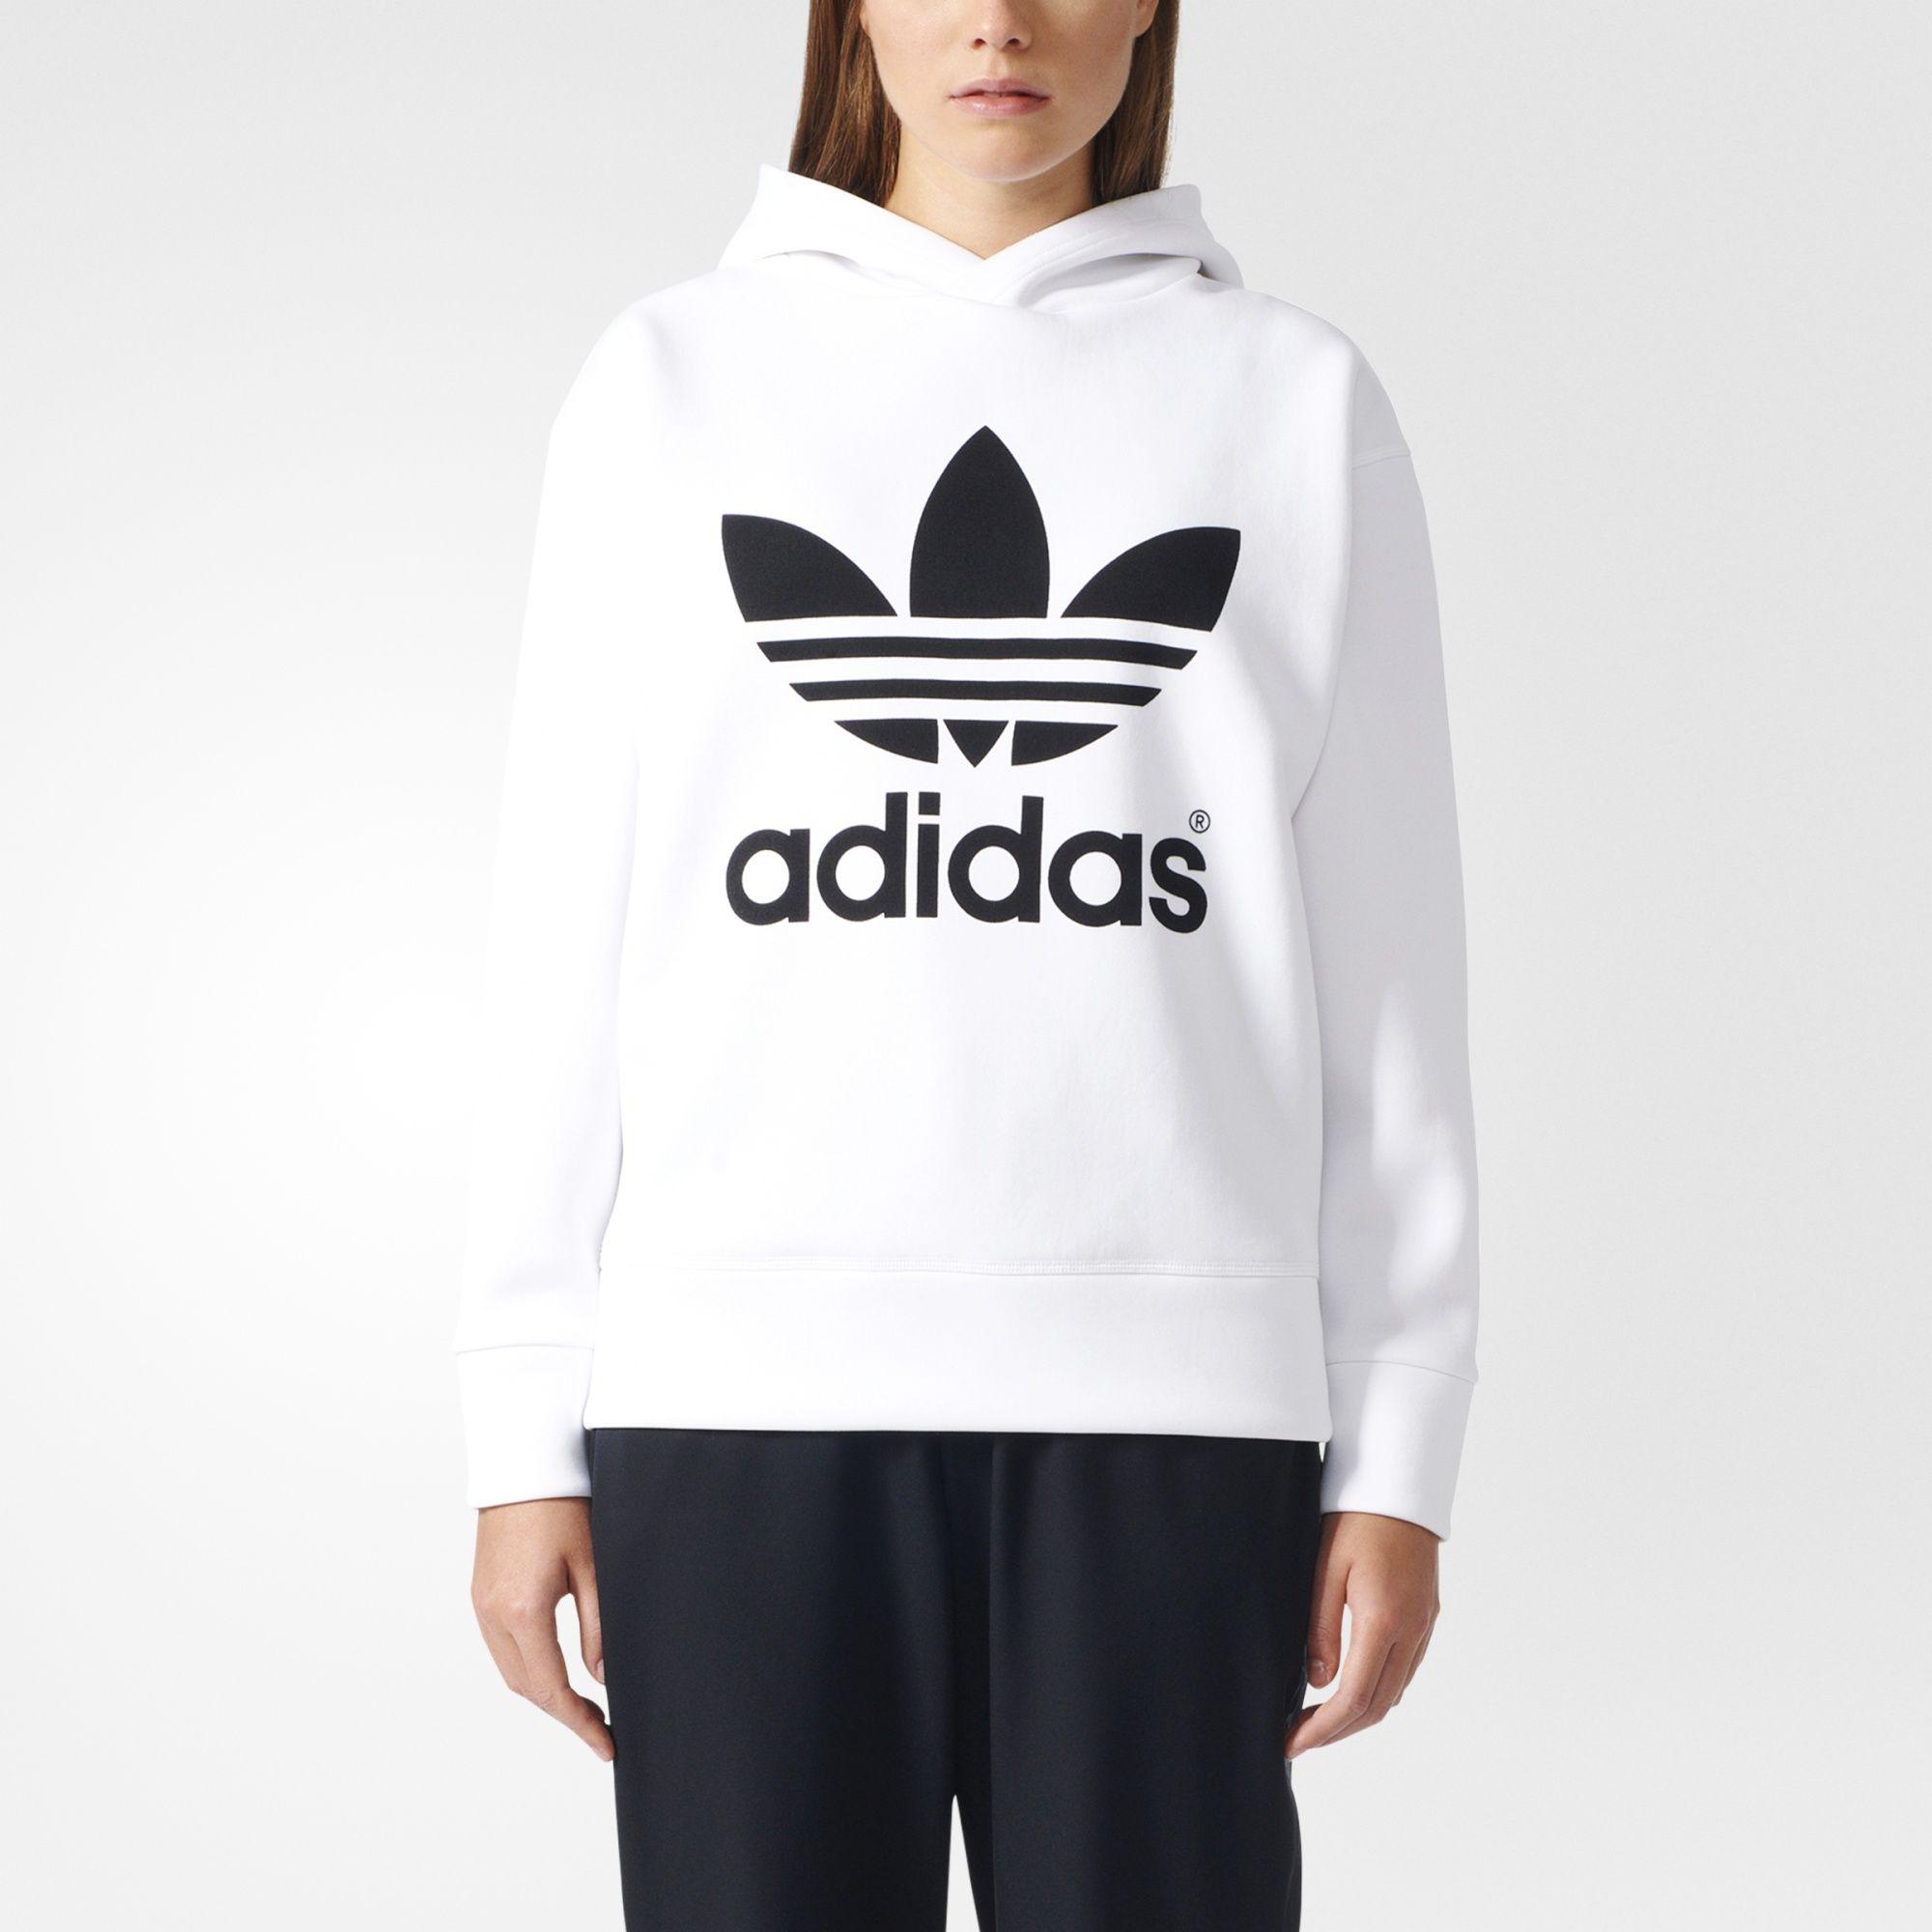 Adidas Hy Hoodie White Adidas Us Women Hoodies Sweatshirts Hoodies Womens Adidas [ 2000 x 2000 Pixel ]